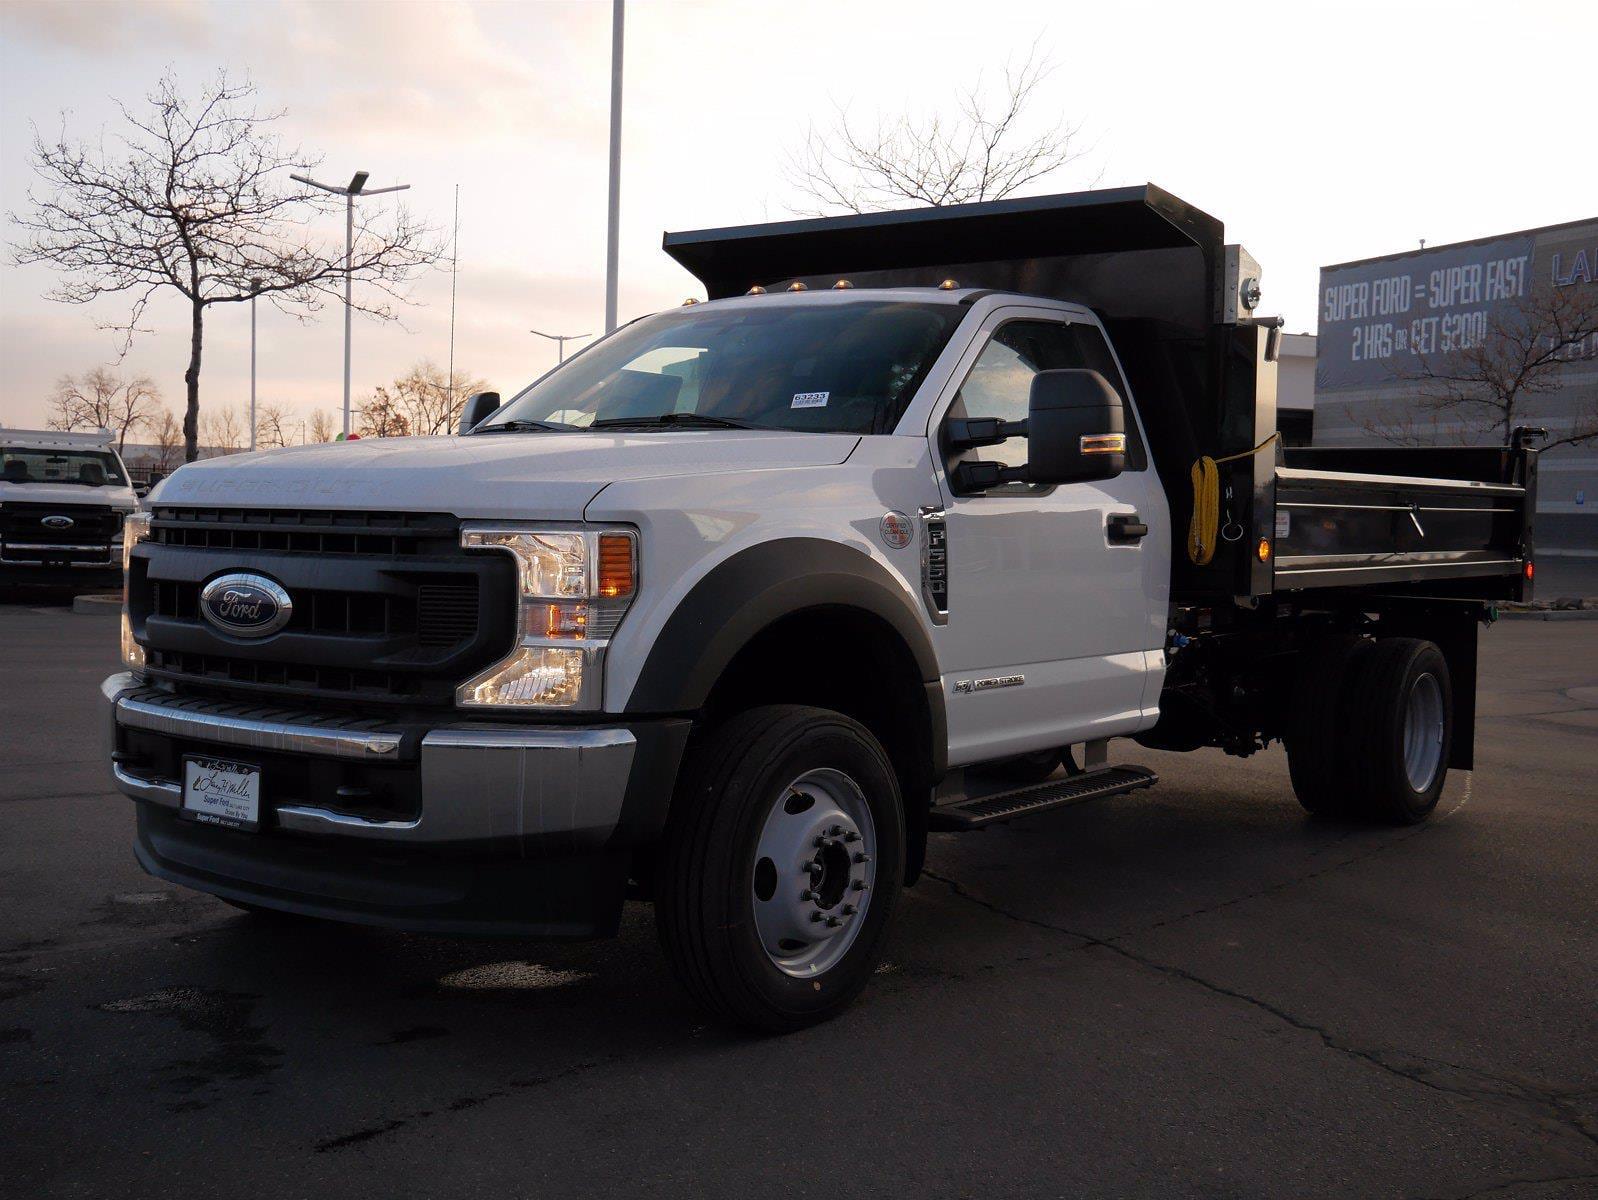 2020 Ford F-550 Regular Cab DRW 4x4, Scelzi Dump Body #63233 - photo 1